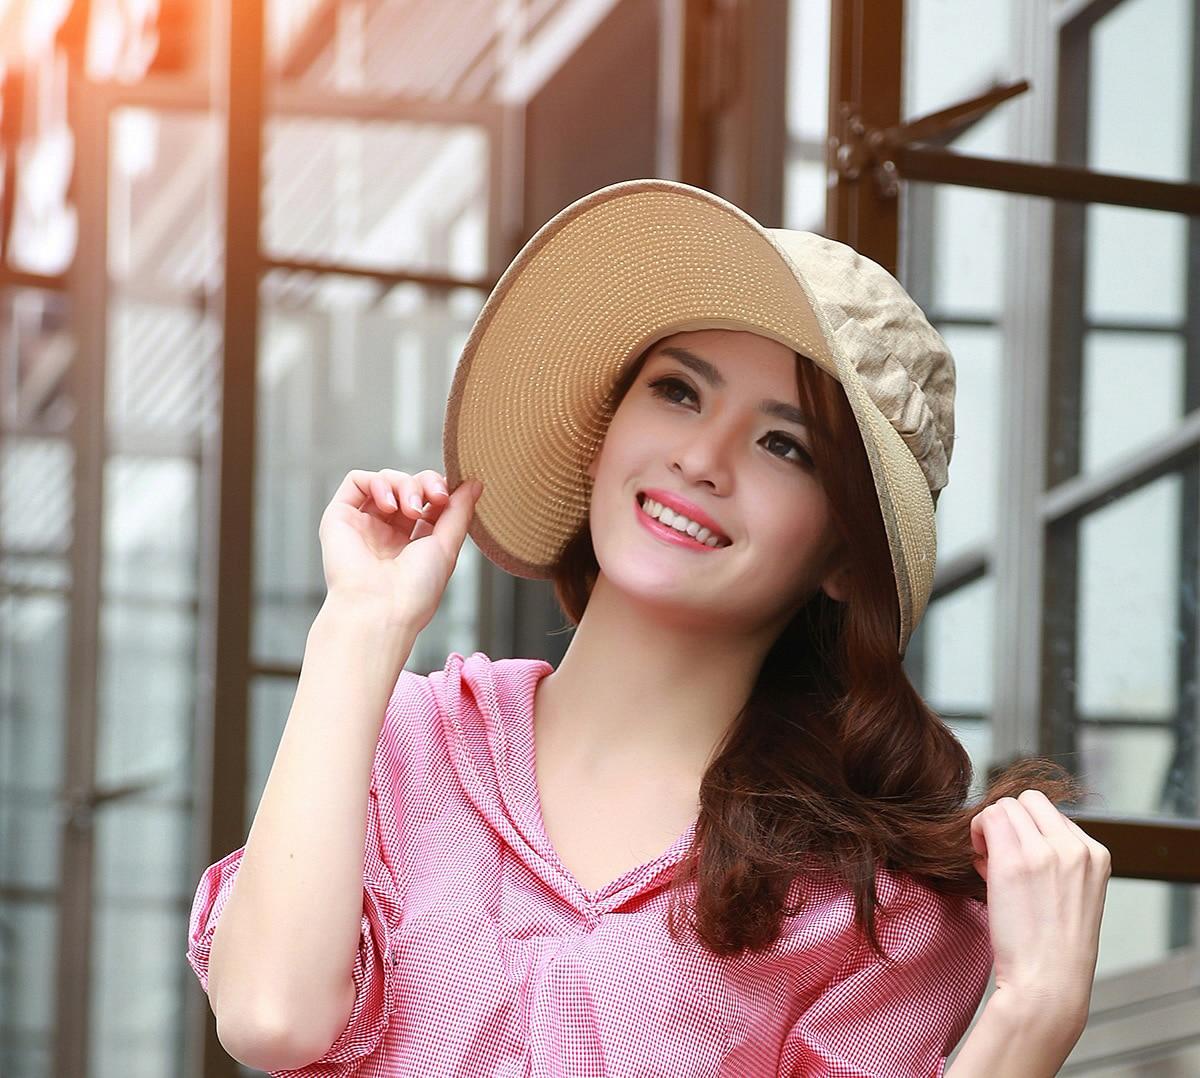 3a77de32188 2015 New fashion women summer sun cap cloth hat straw hat visor ...